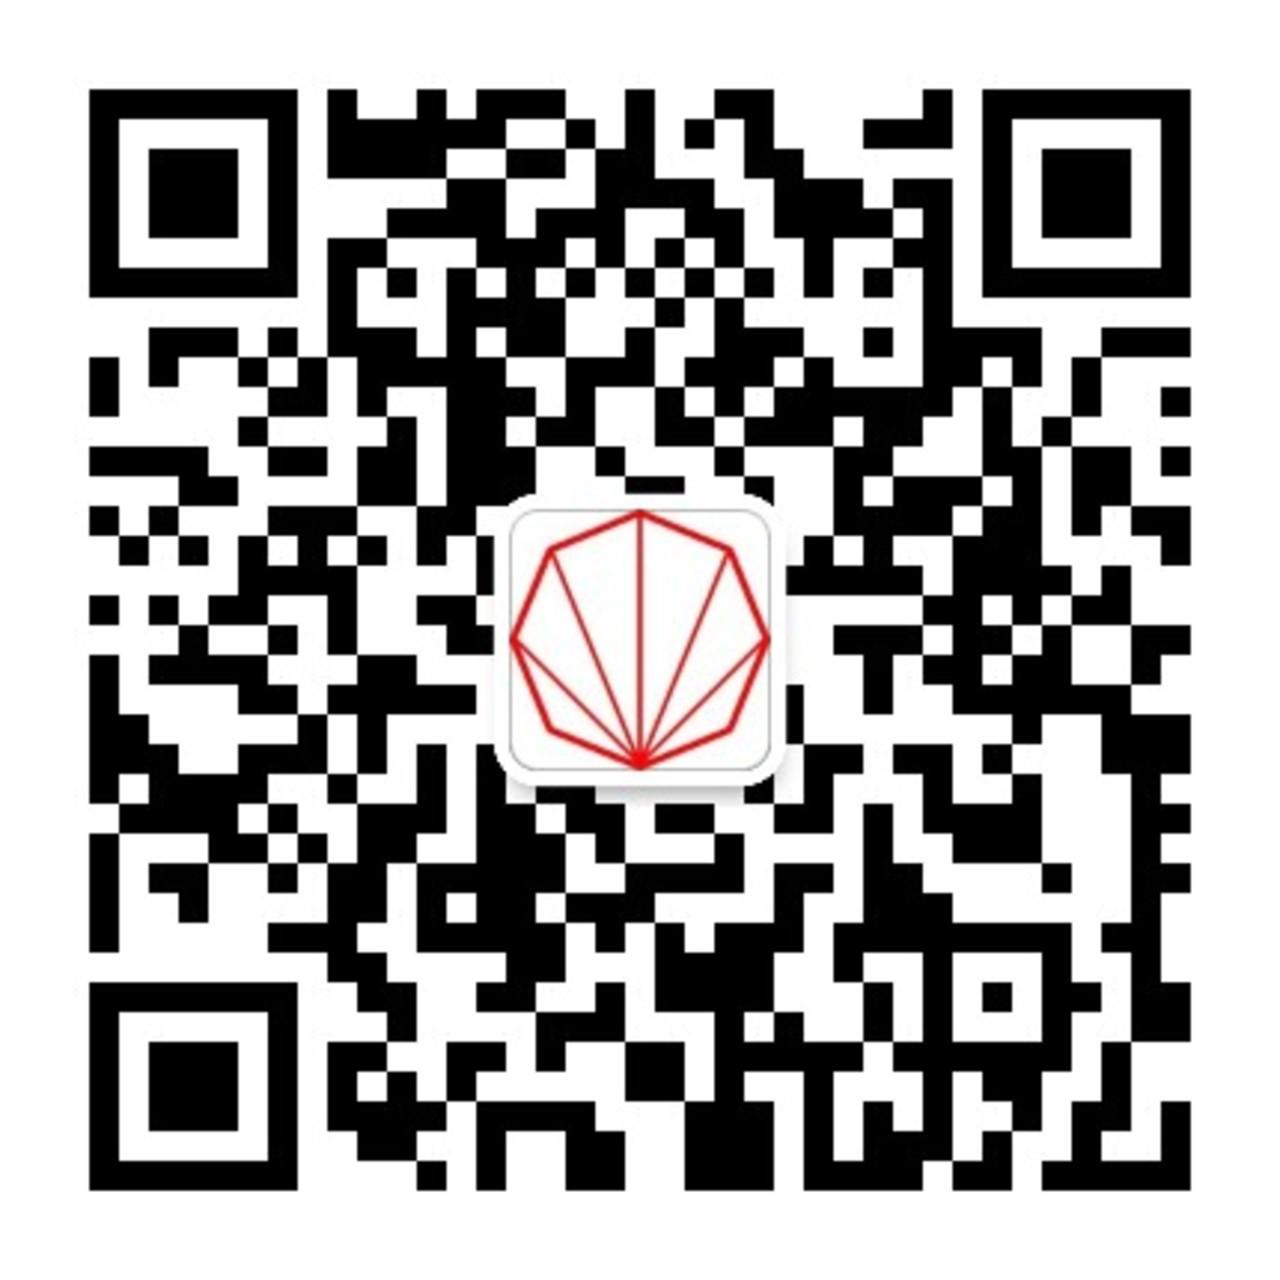 qrcode_for_成都完形工业设计公司_1280